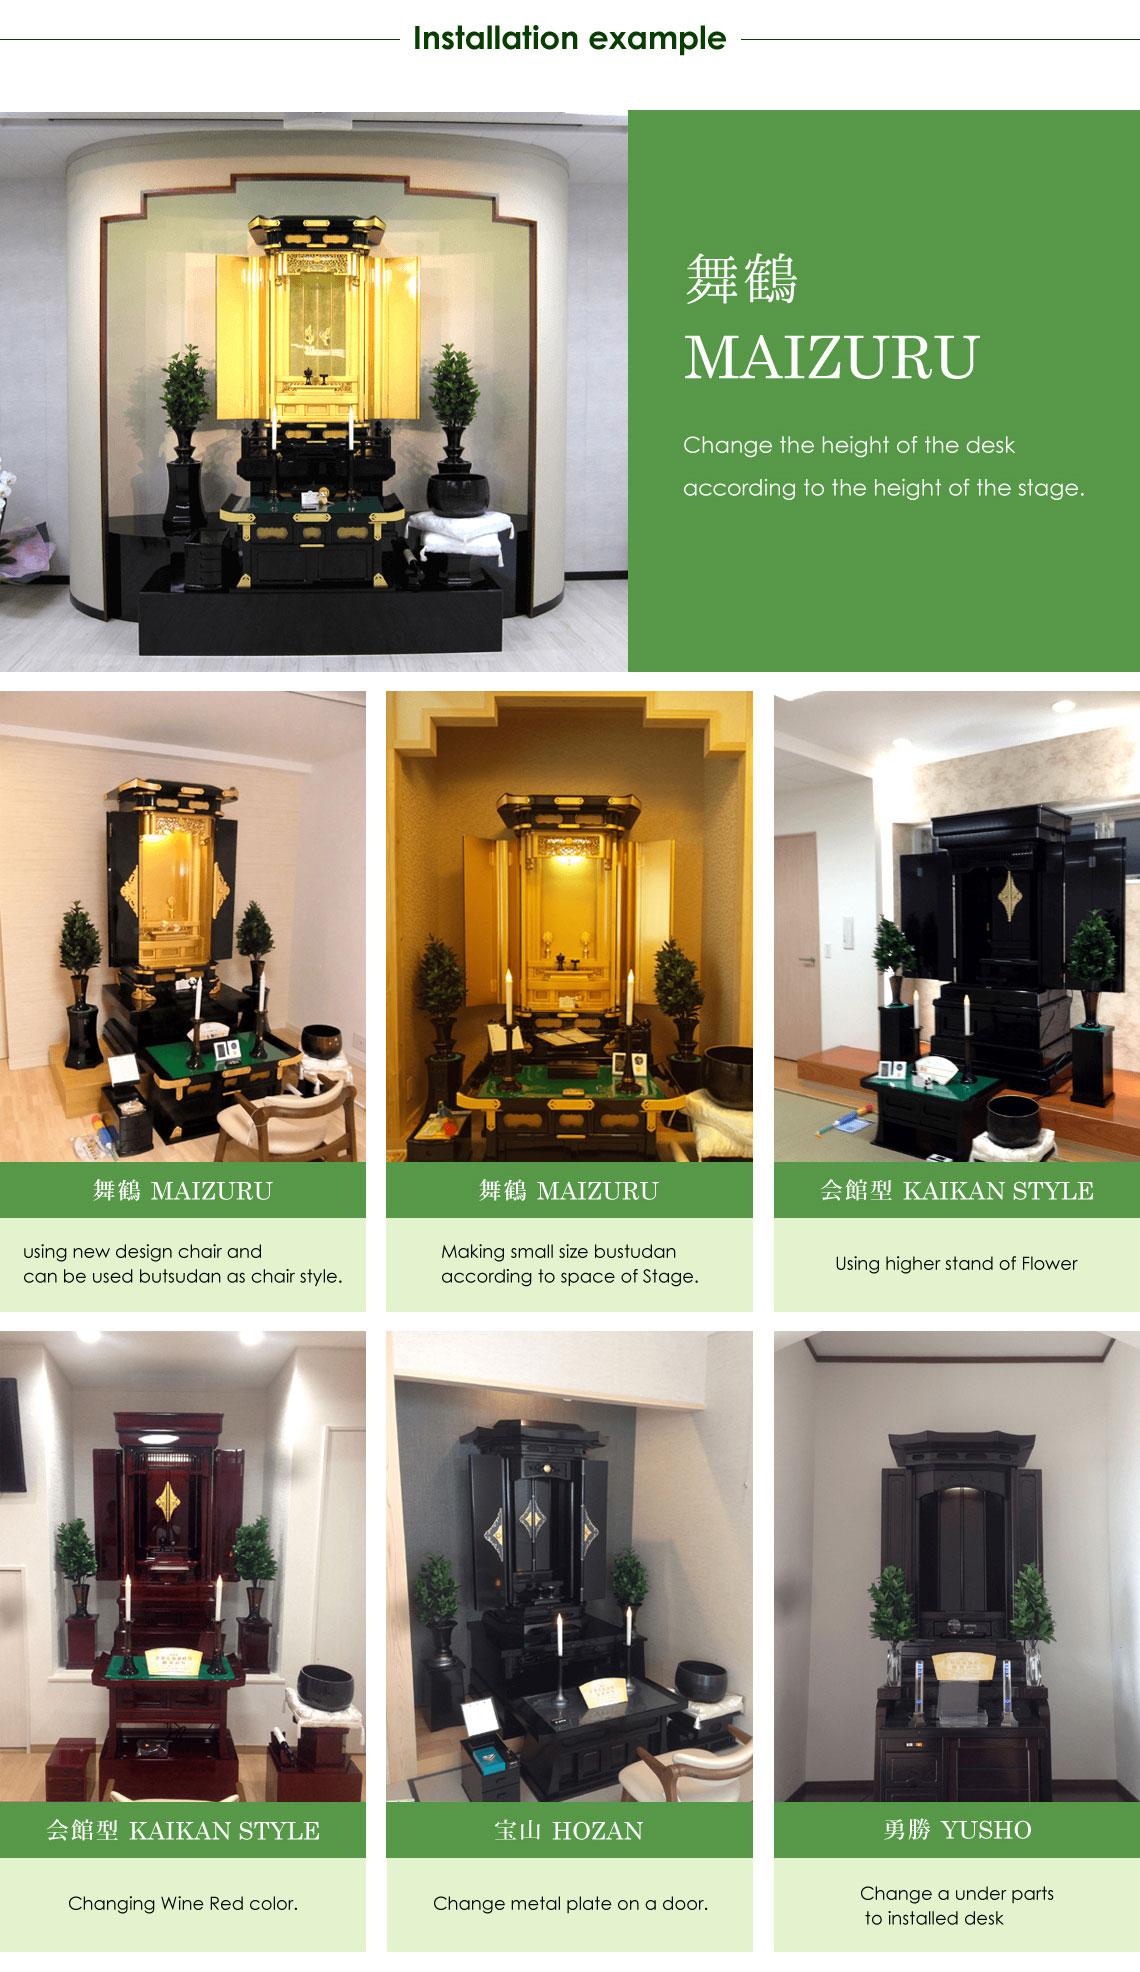 Installation example,maizuru,kaikanstyle,kaikanstyle,hozan,Yusho